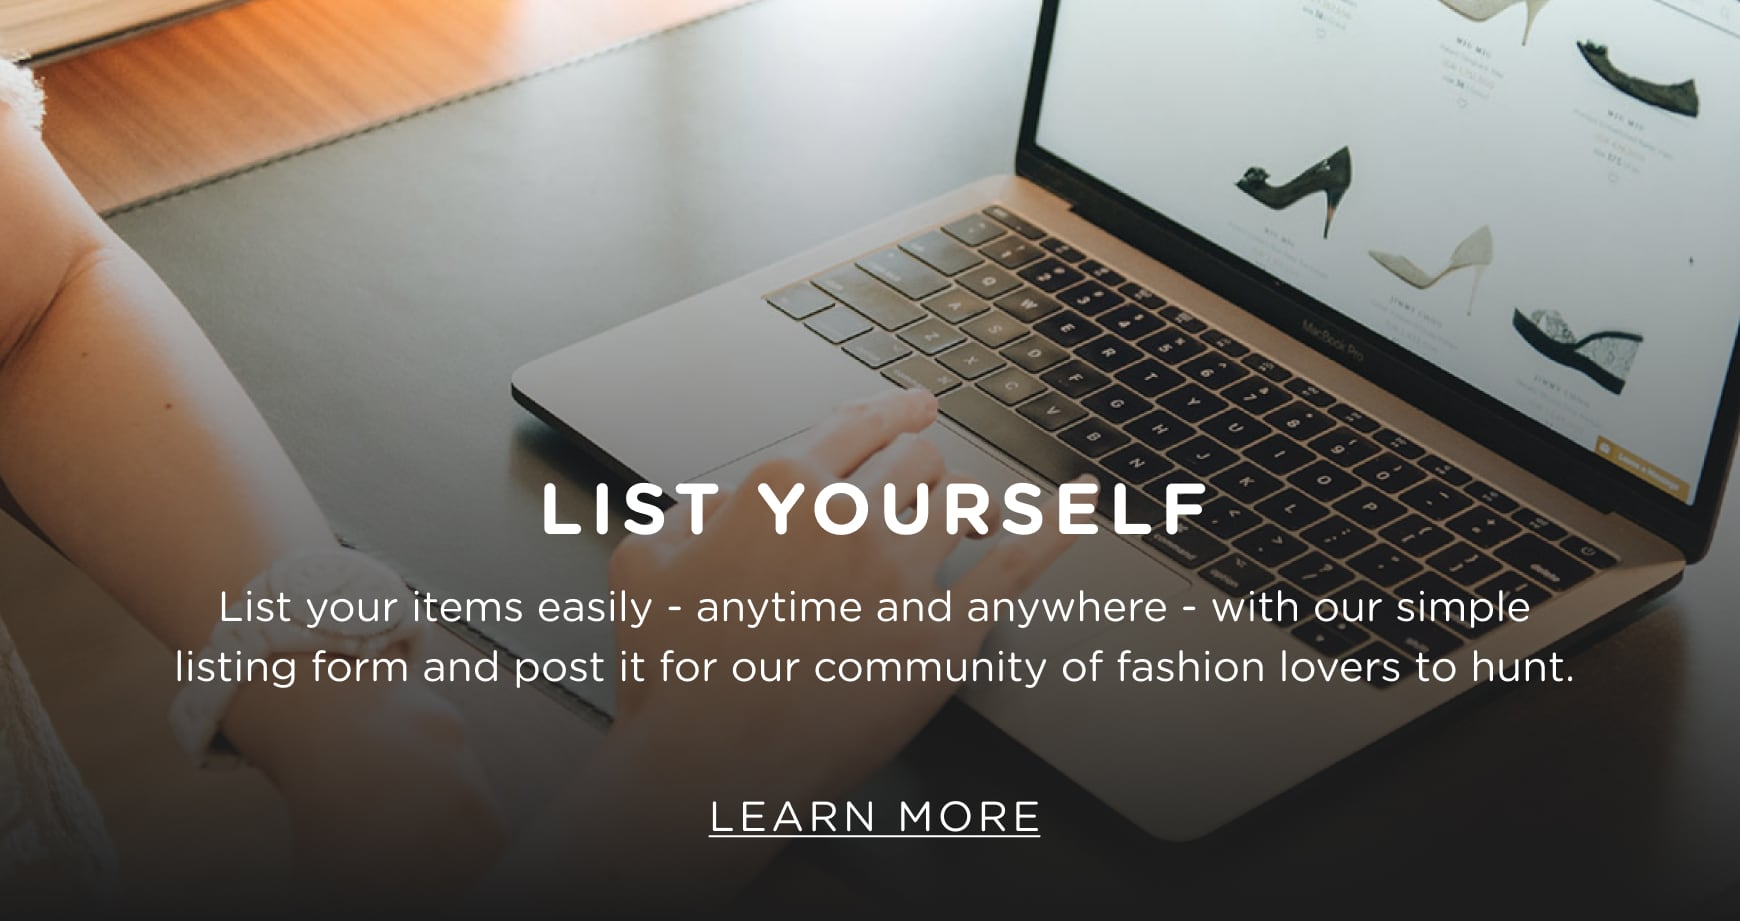 List Yourself